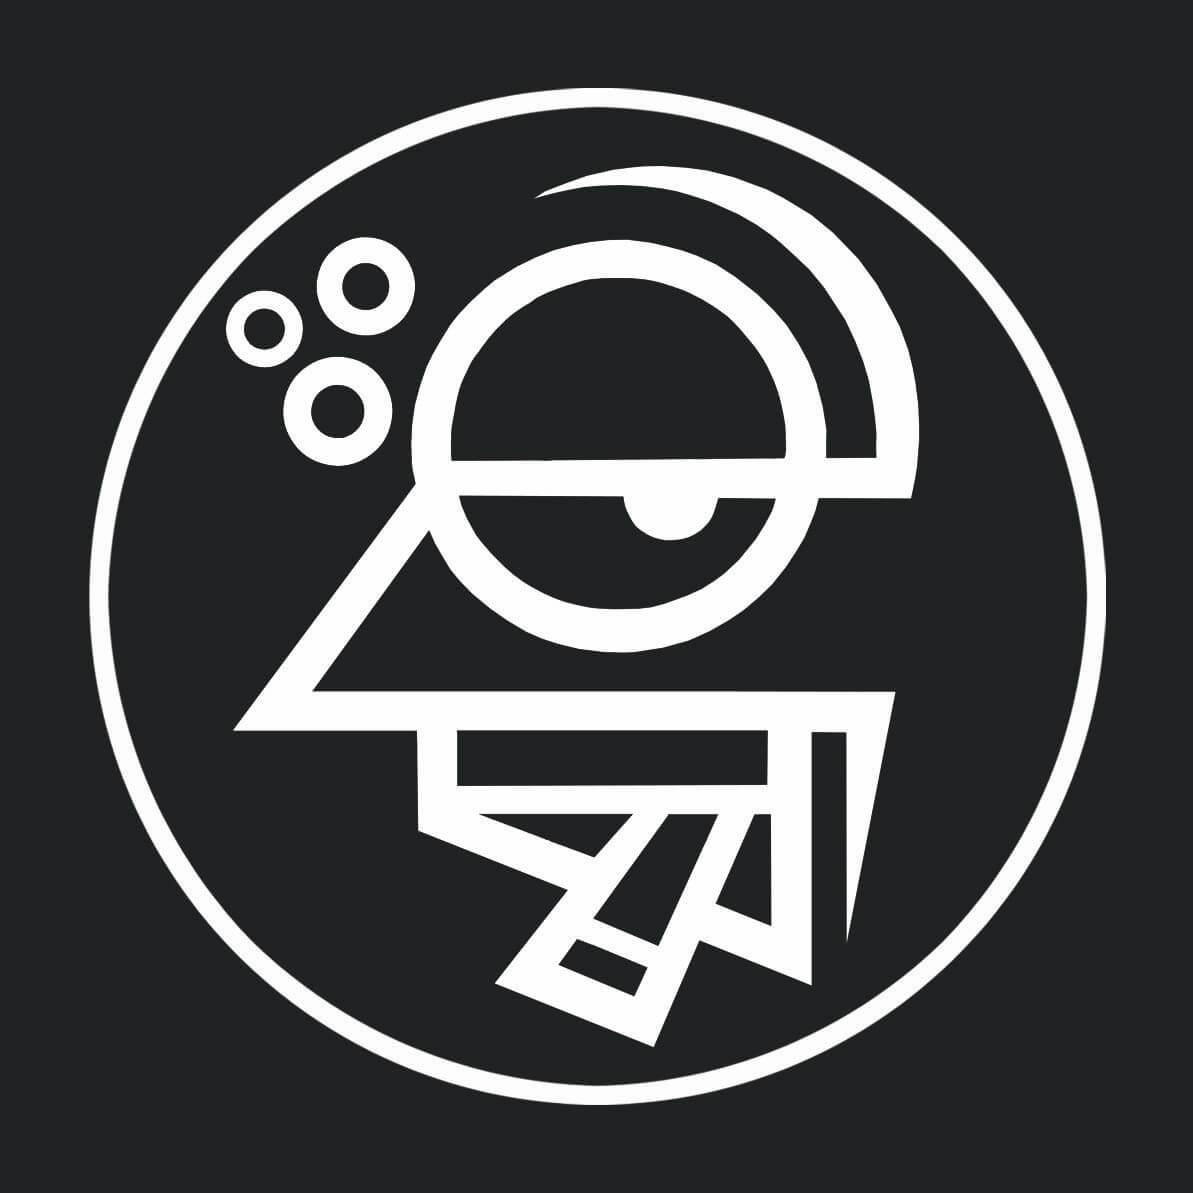 Company Slow Logo - Company Slow Frankenburger